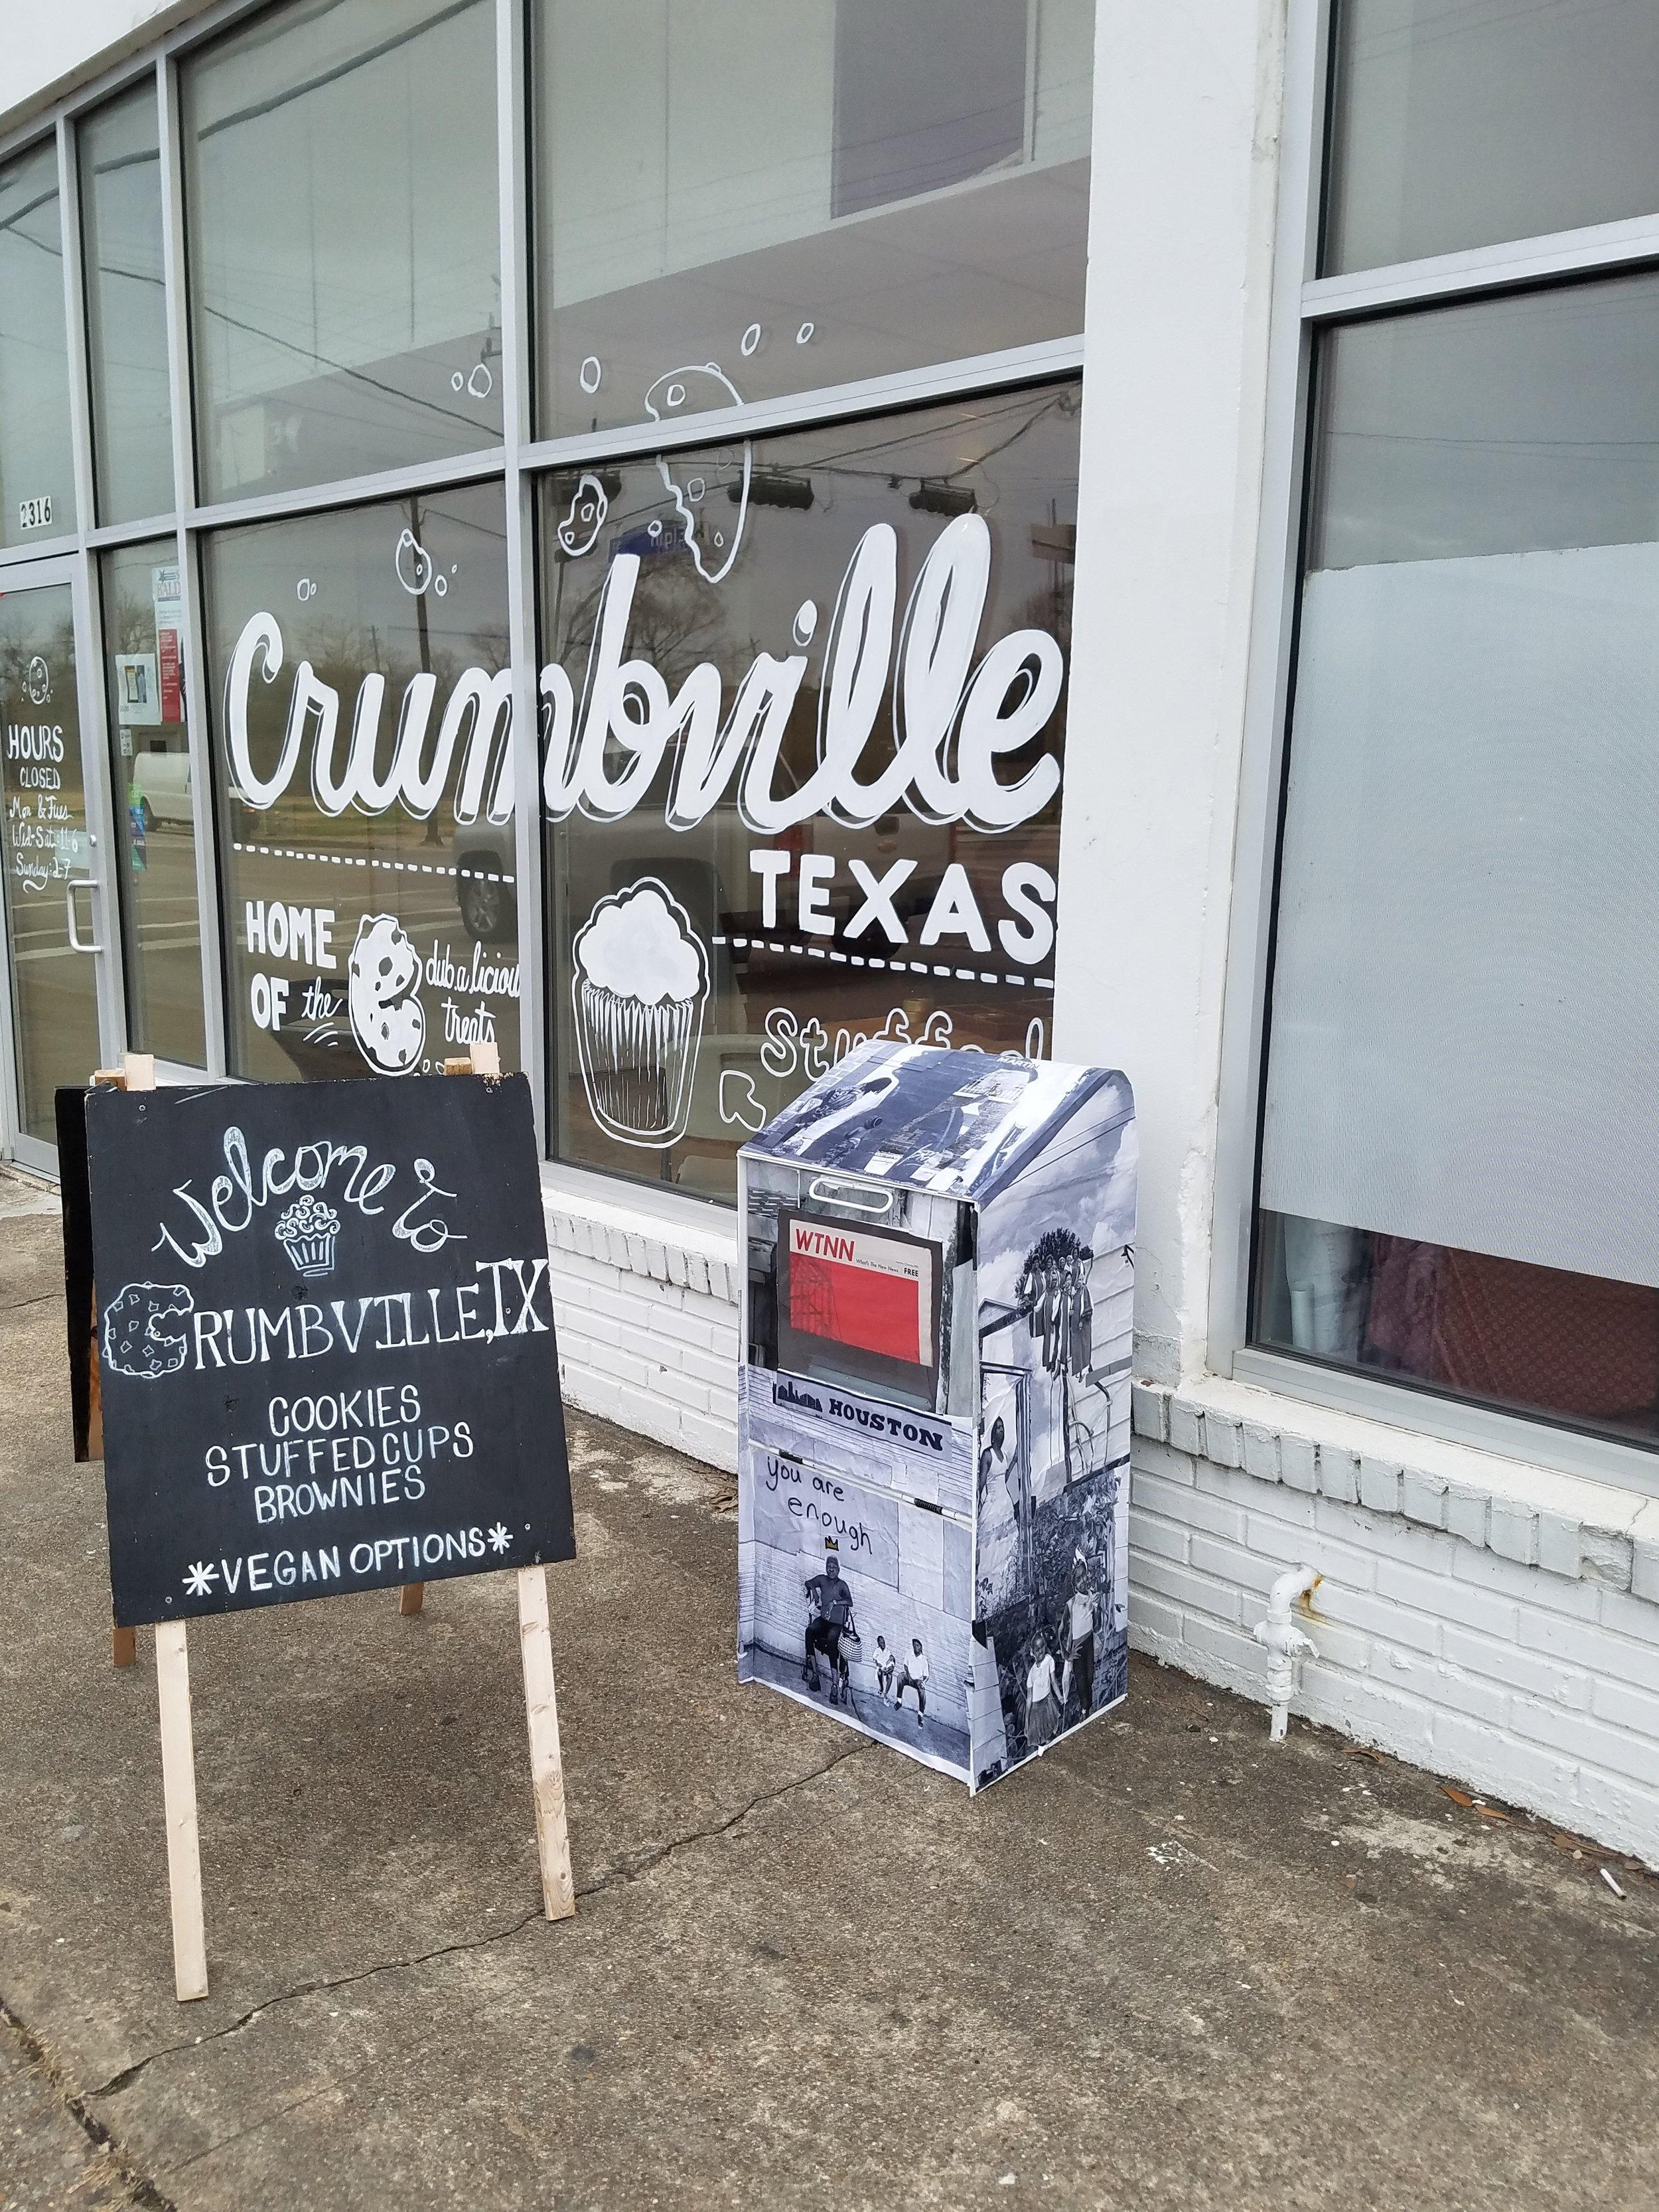 Brian Ellison's sculpture at Crumbville TX